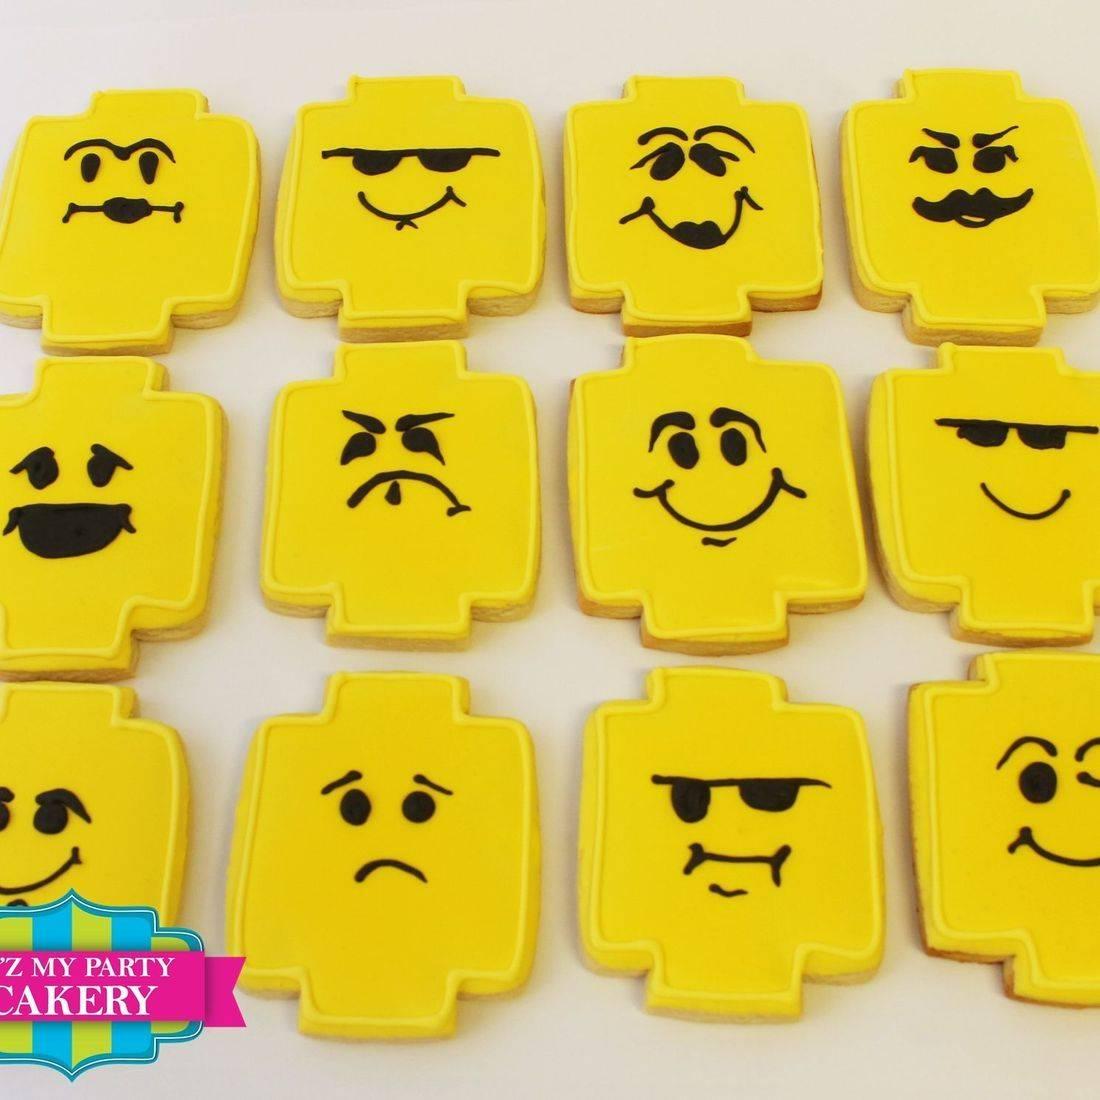 Lego Emoji cookies Milwaukee